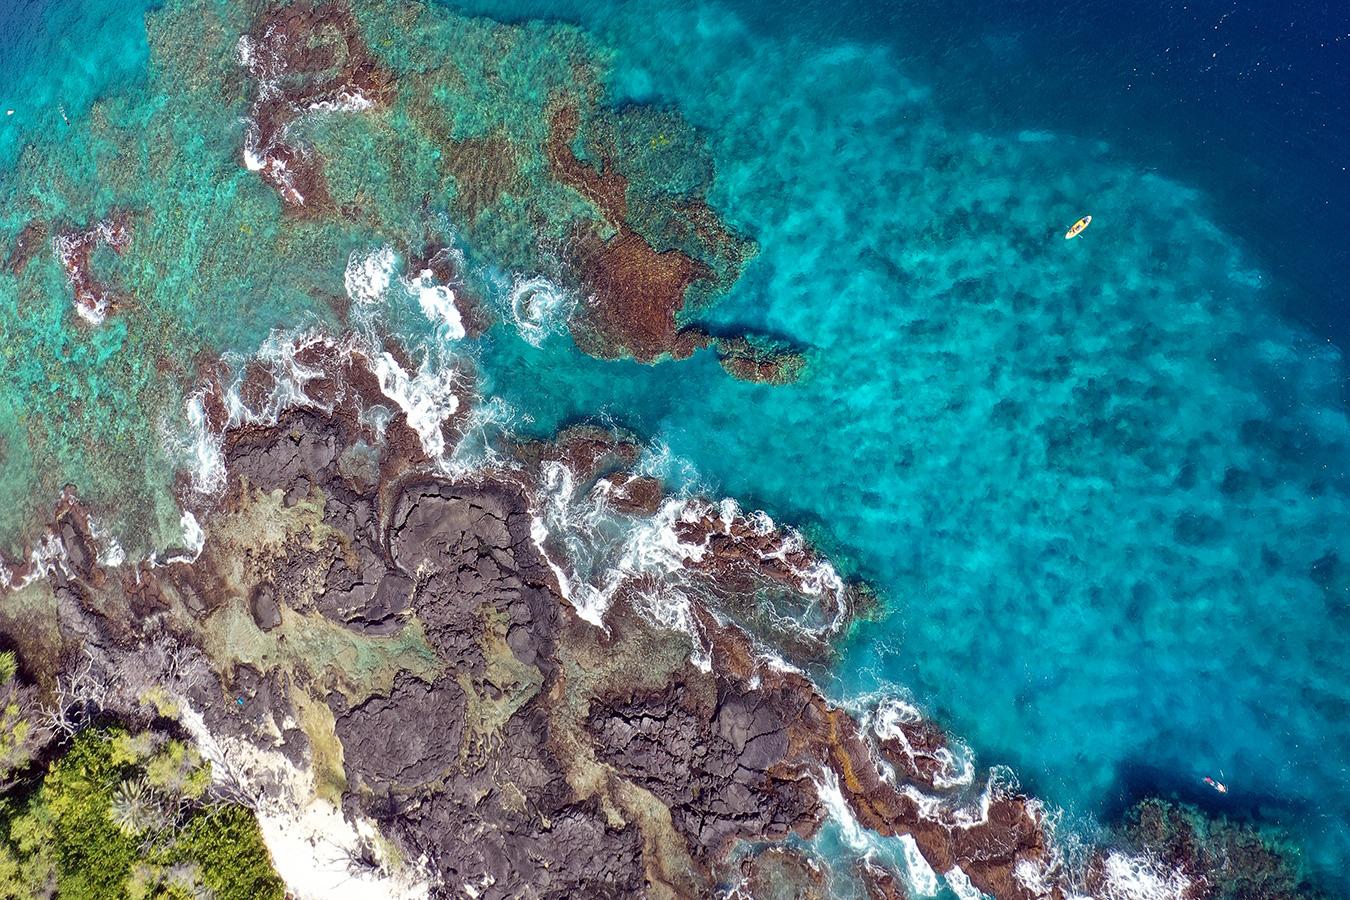 Coastline off Hawaii. Photo by Rhett A. Butler.